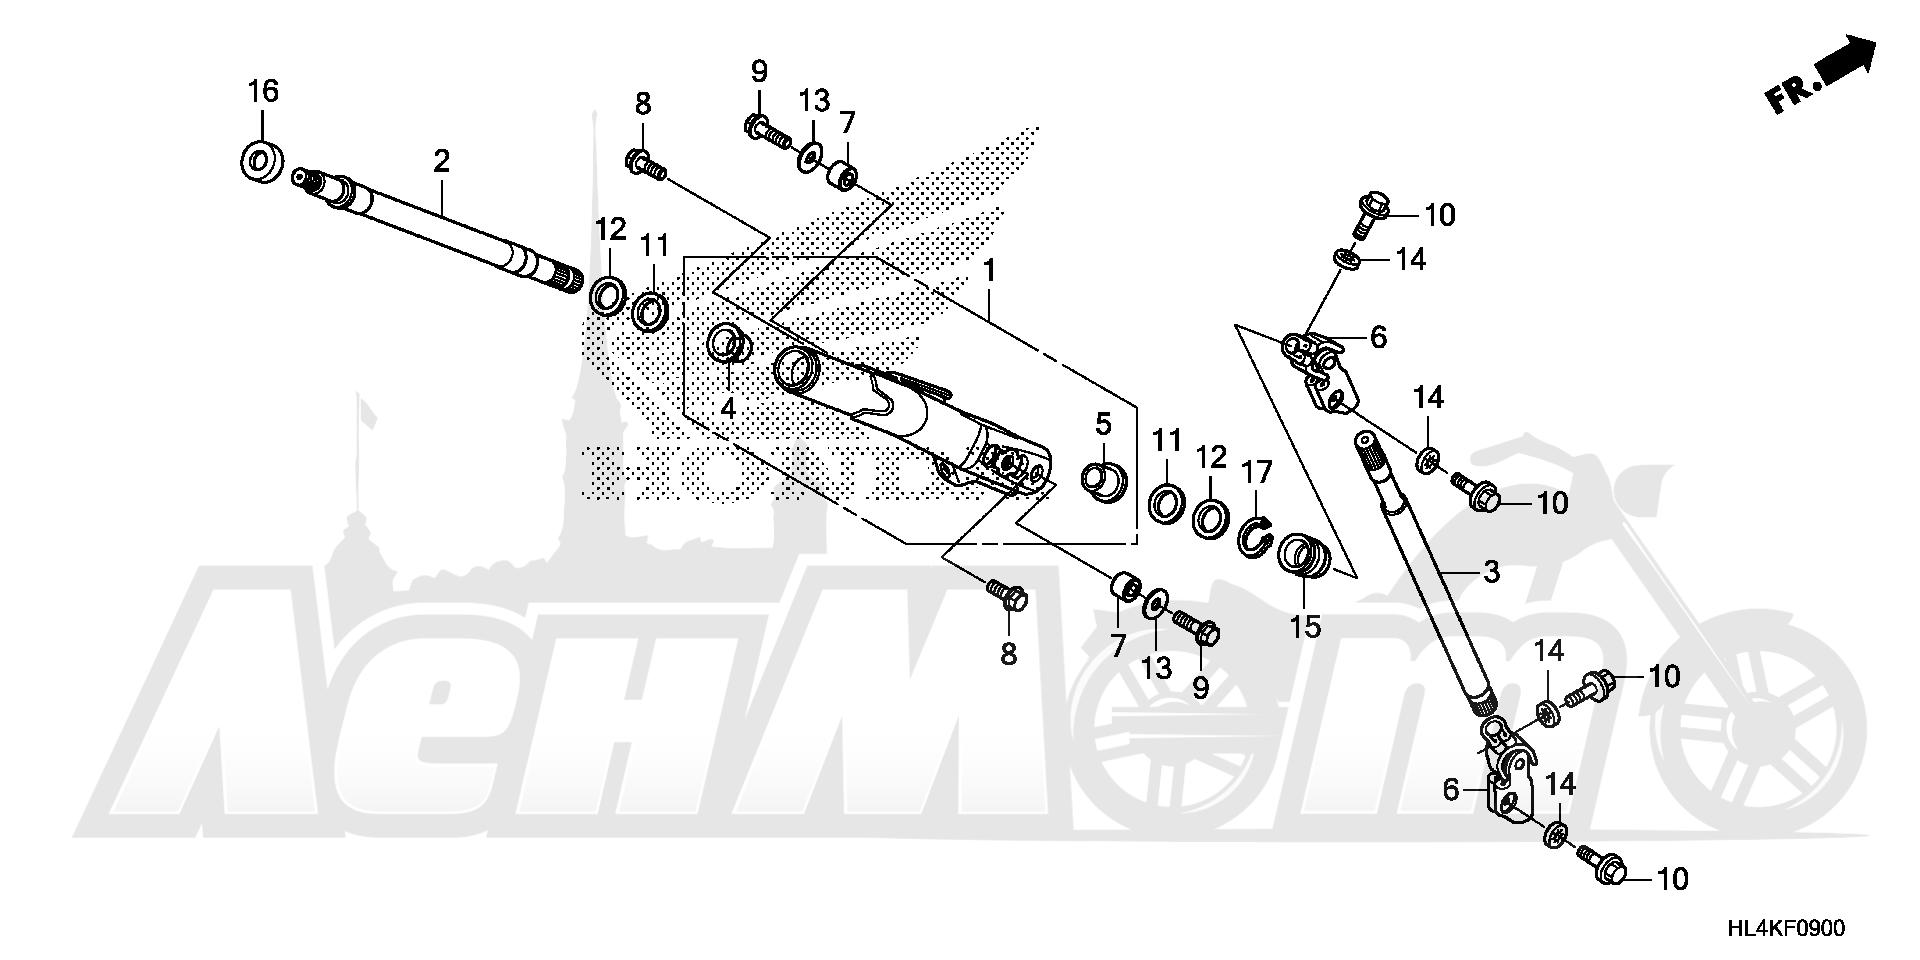 Запчасти для Квадроцикла Honda 2019 SXS1000M5L Раздел: STEERING SHAFT | рулевой вал